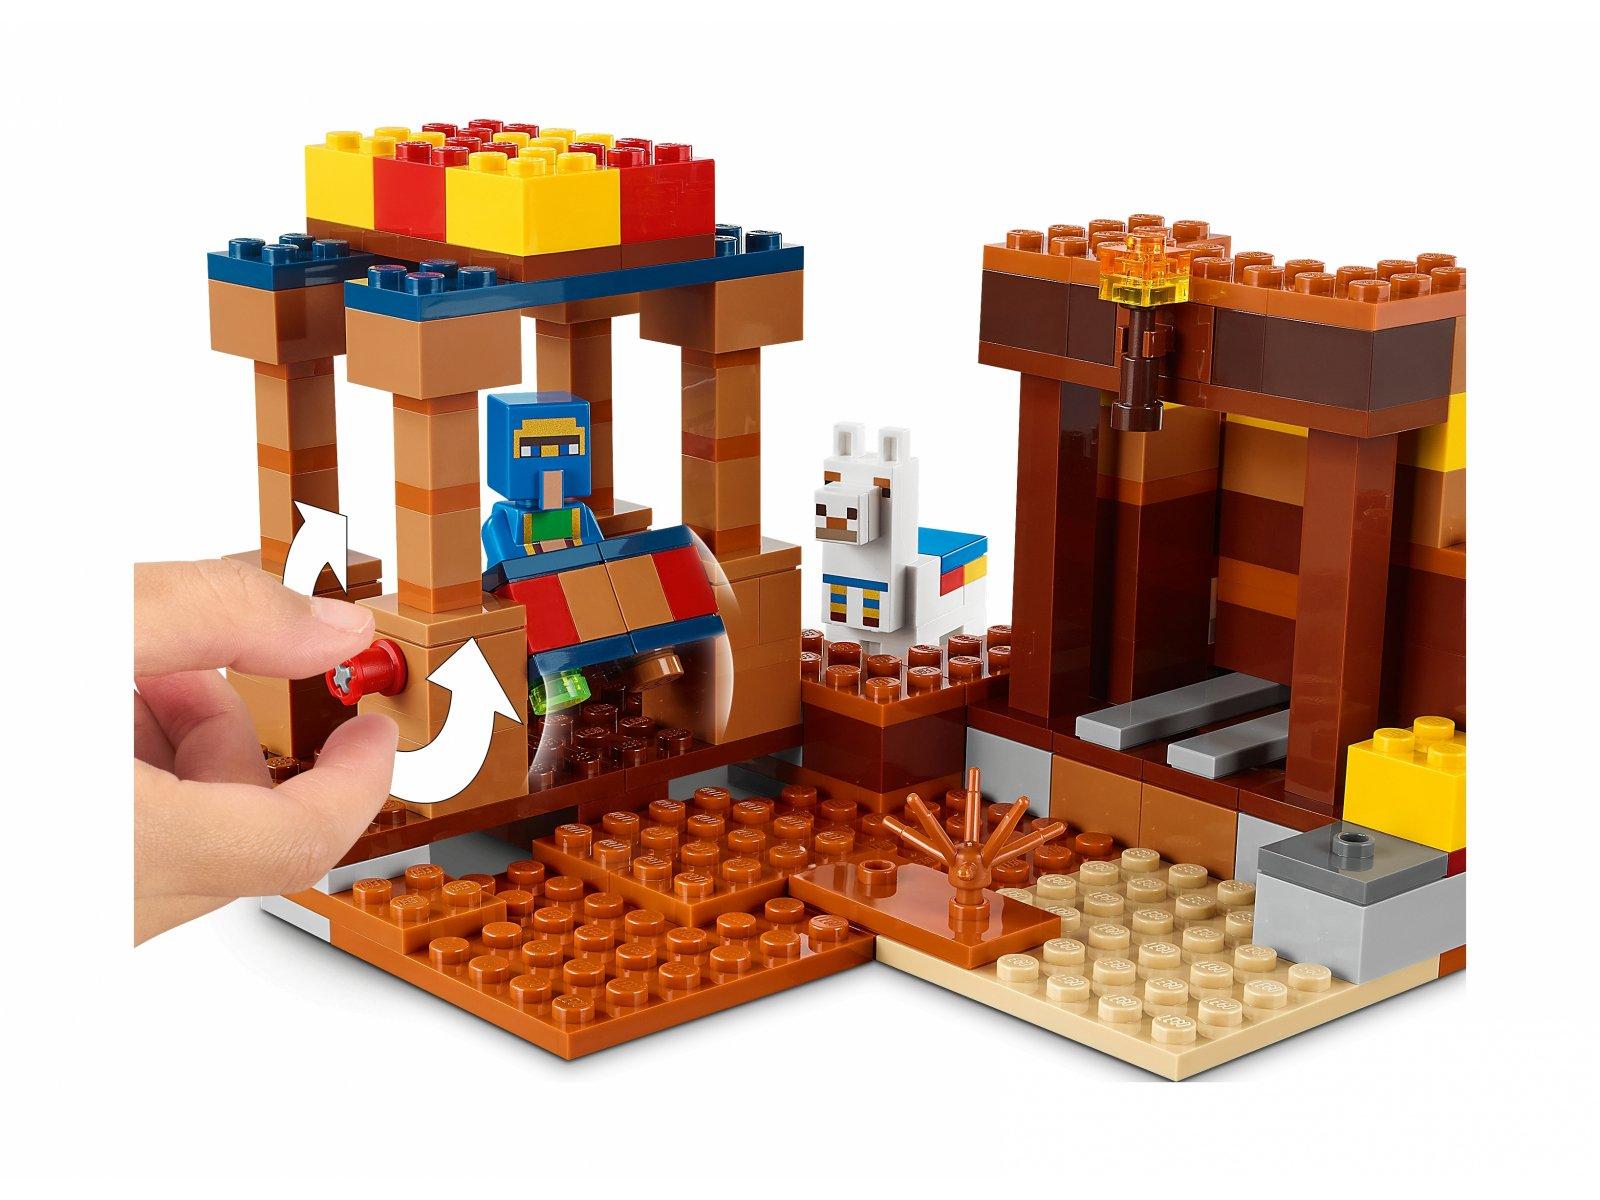 LEGO 21167 Minecraft Punkt handlowy